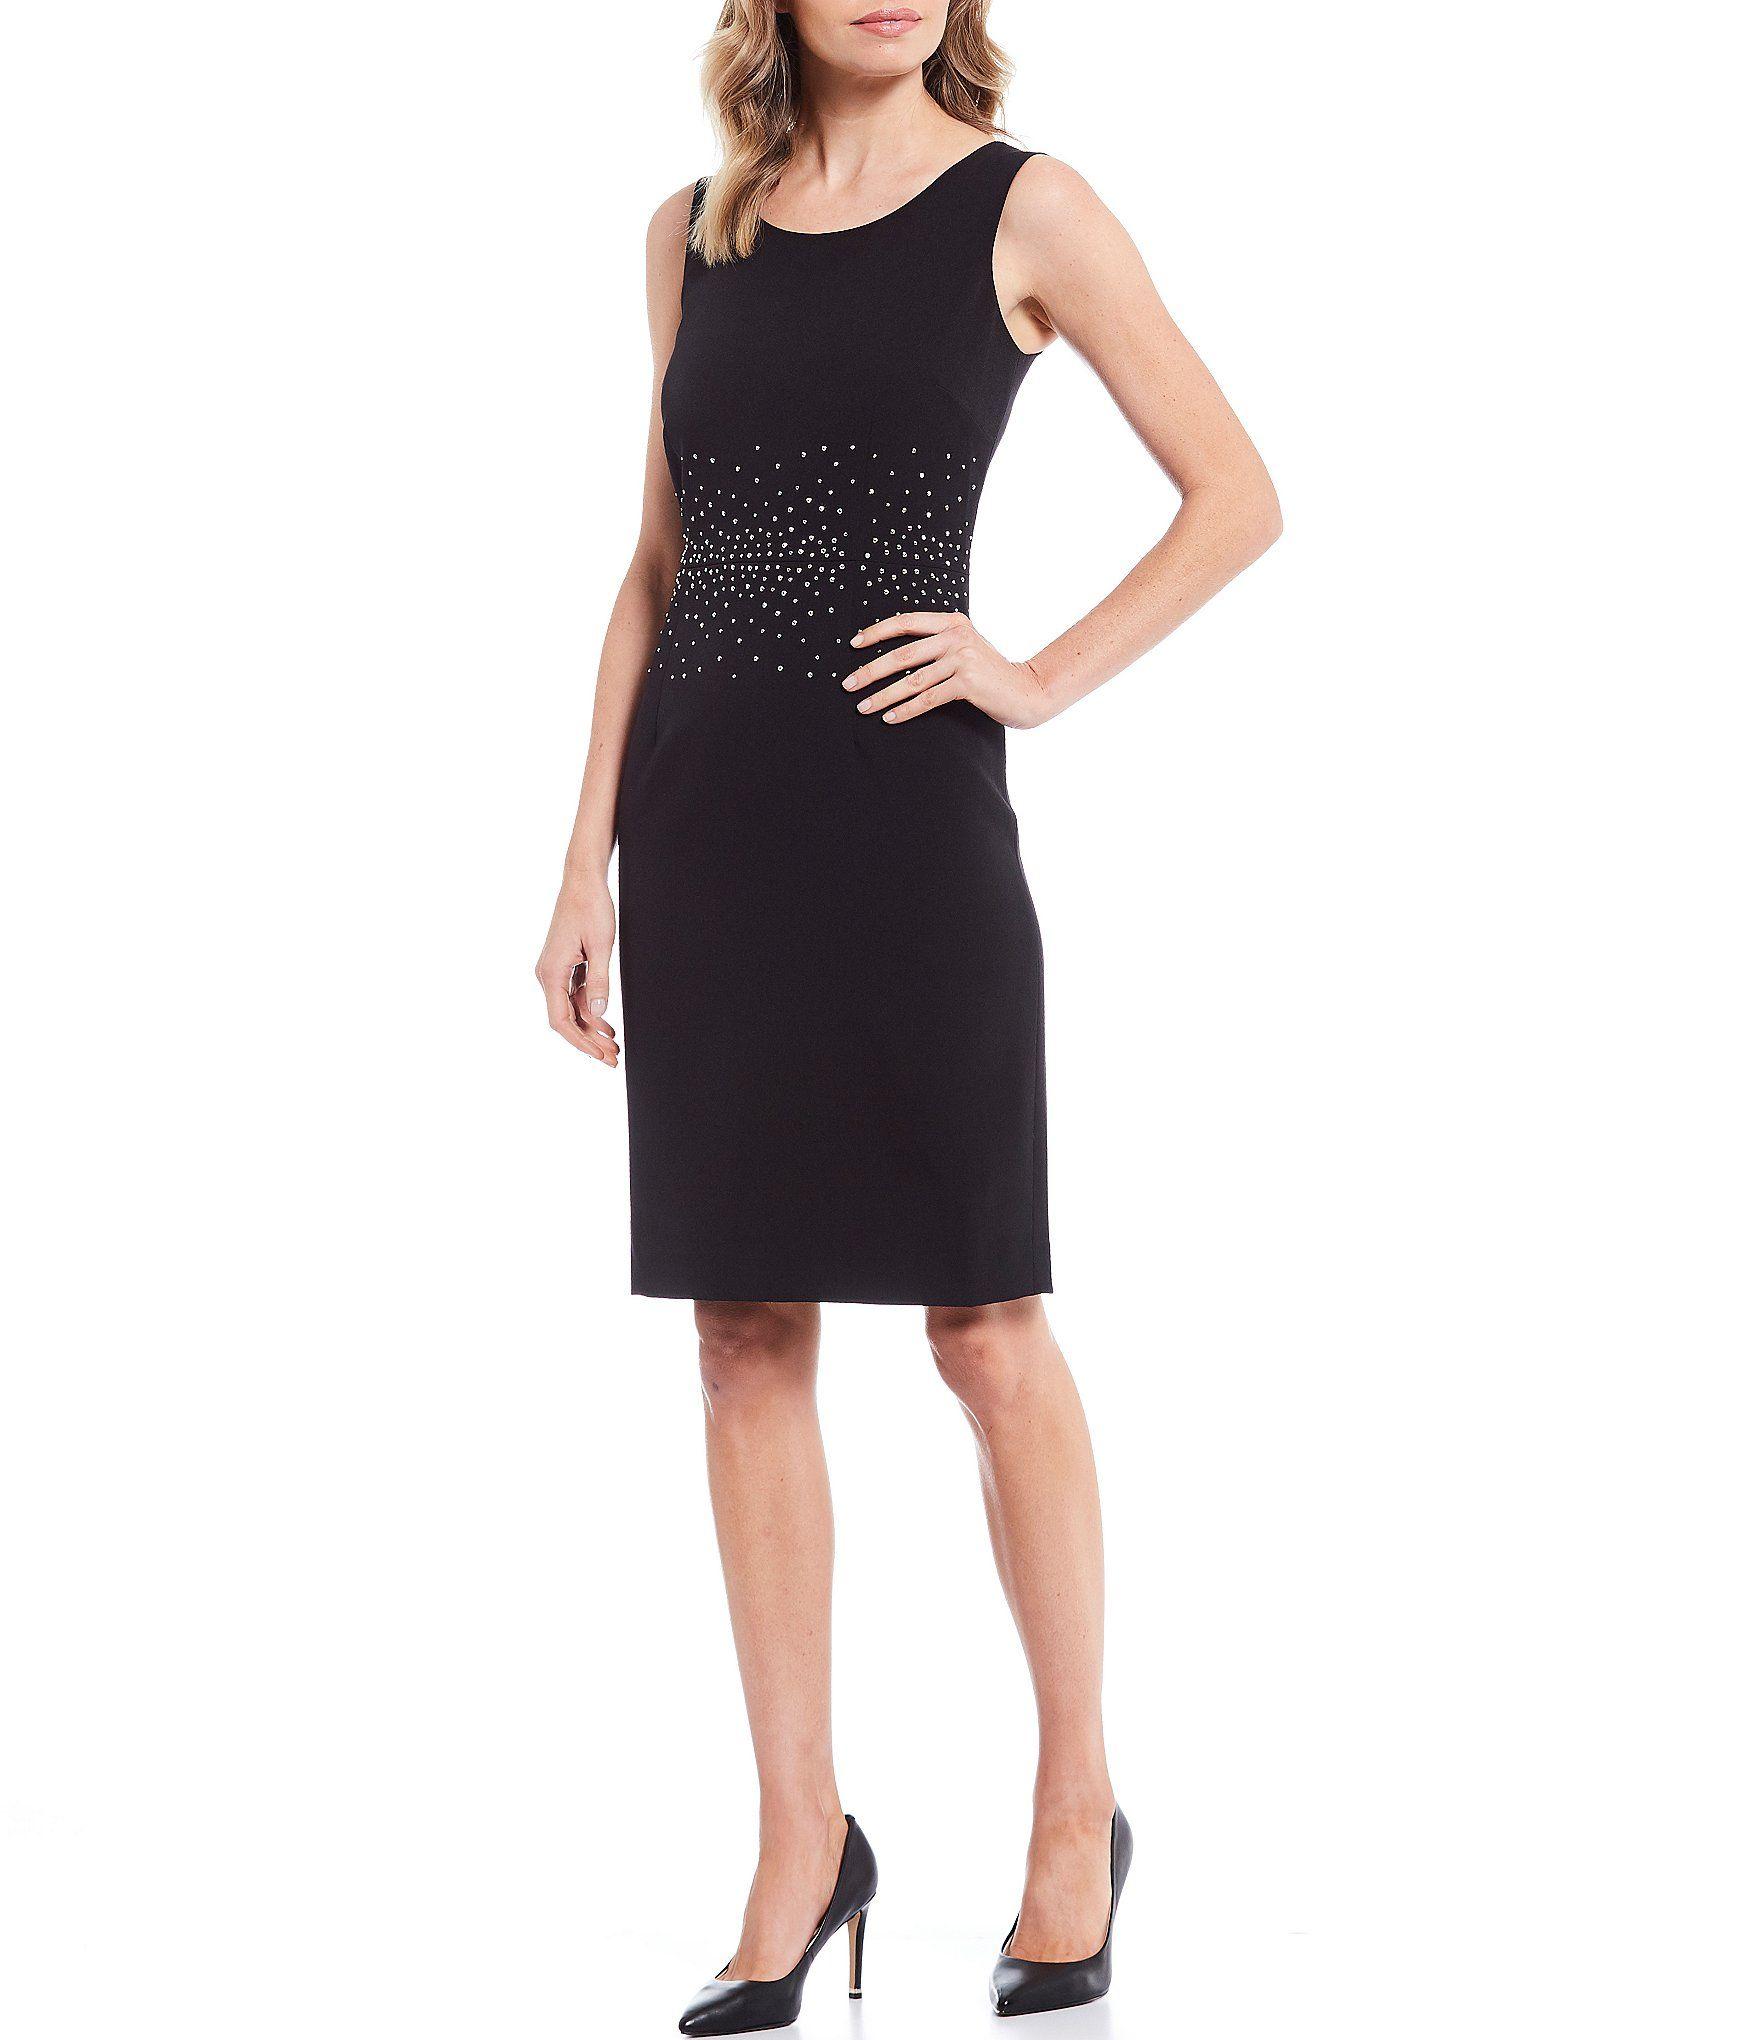 Kasper Petite Size Stretch Crepe Stud Trim Detailed Jewel Neck Sleeveless Dress | Dillard's